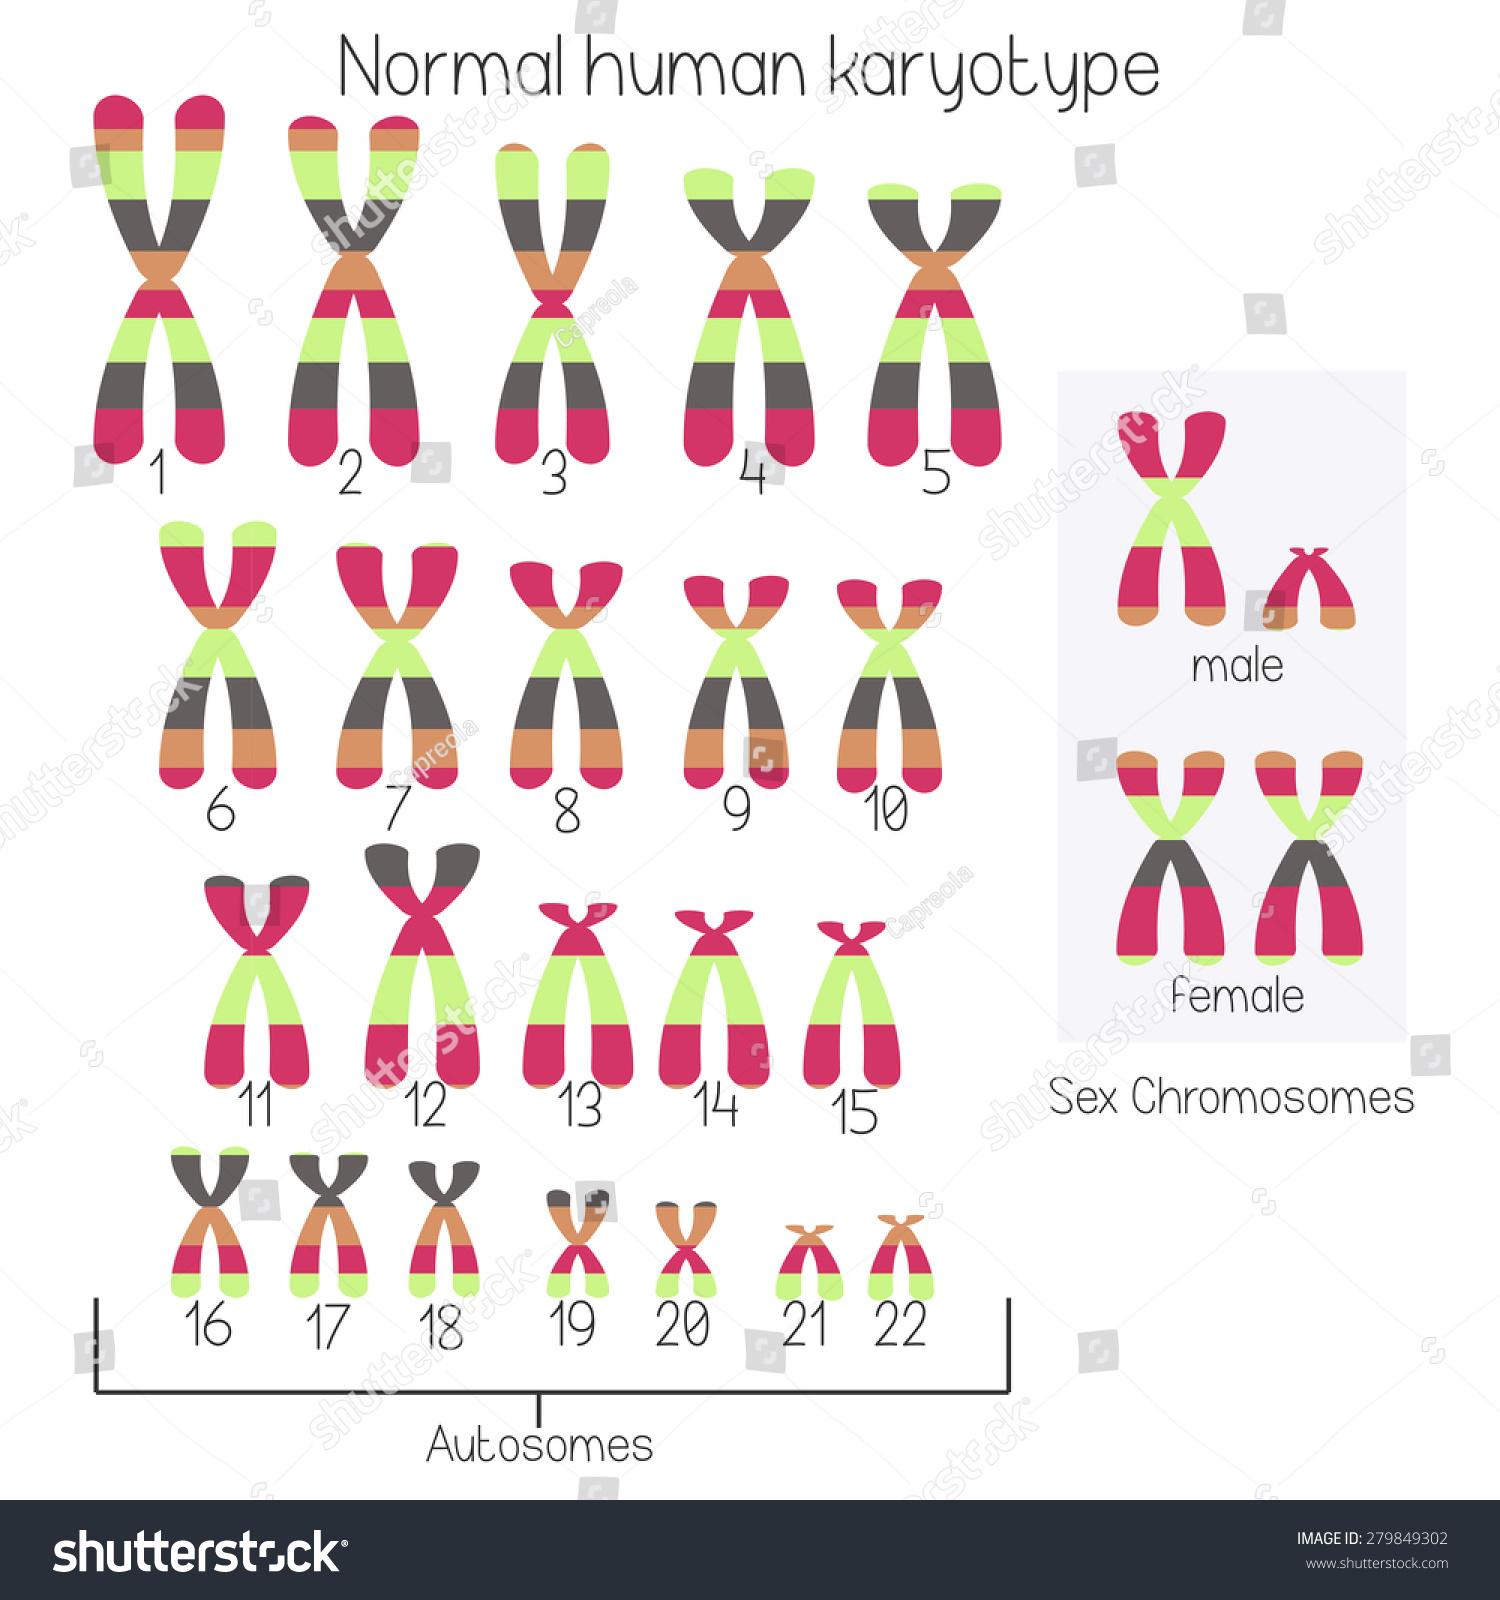 Normal Human Karyotype Chromosome Idiogram Stock Vector